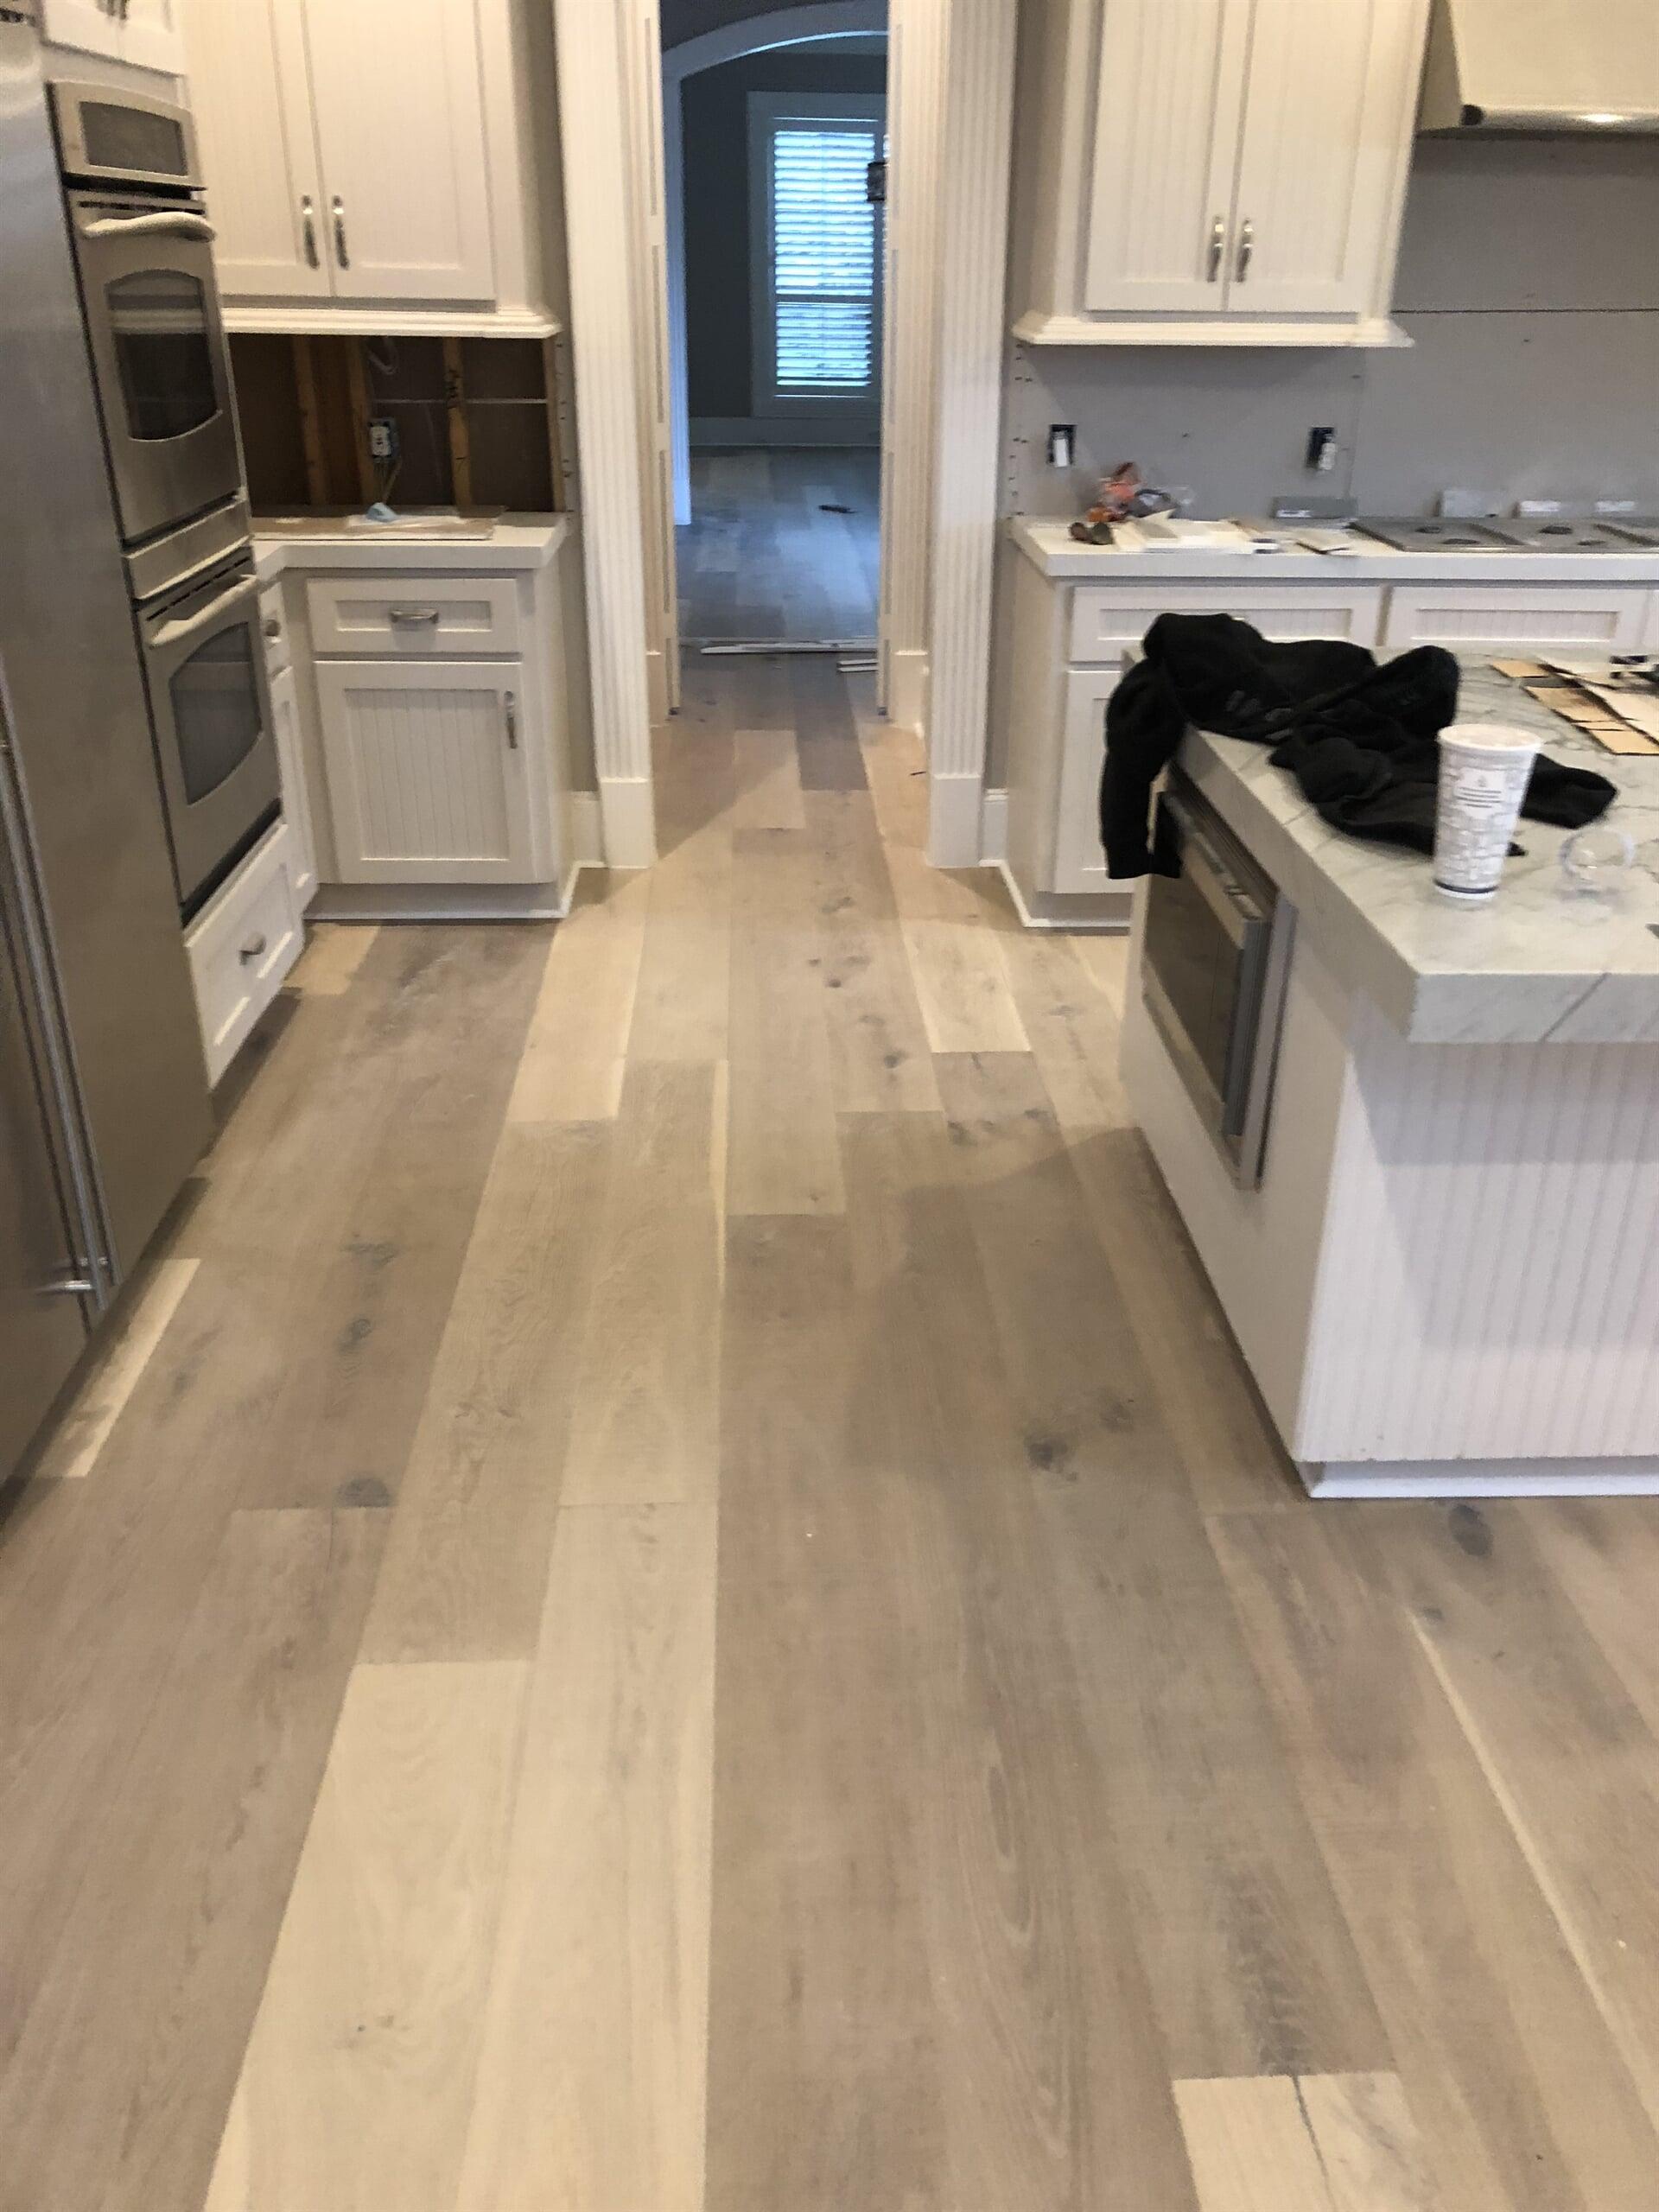 Engineered Hardwood flooring from Houston Floor Installation Services in Humble, TX